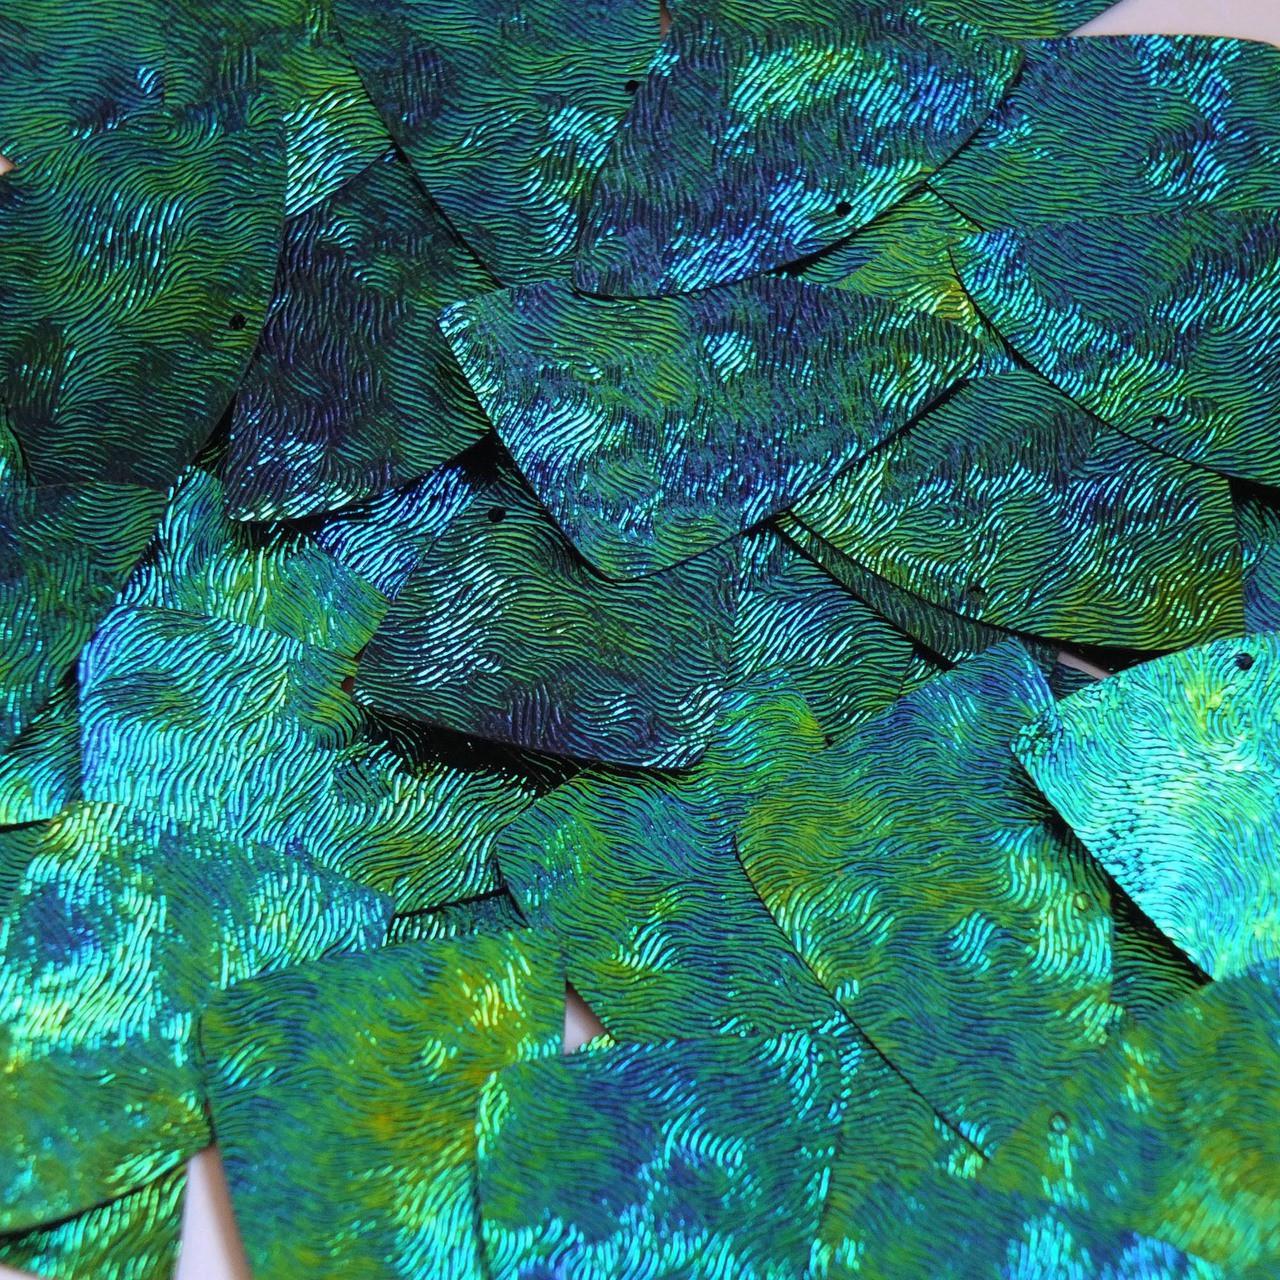 "Fishscale Fin Sequin 1.5"" Van Gogh Starry Night Blue Green Embosssed Swirl Texture"